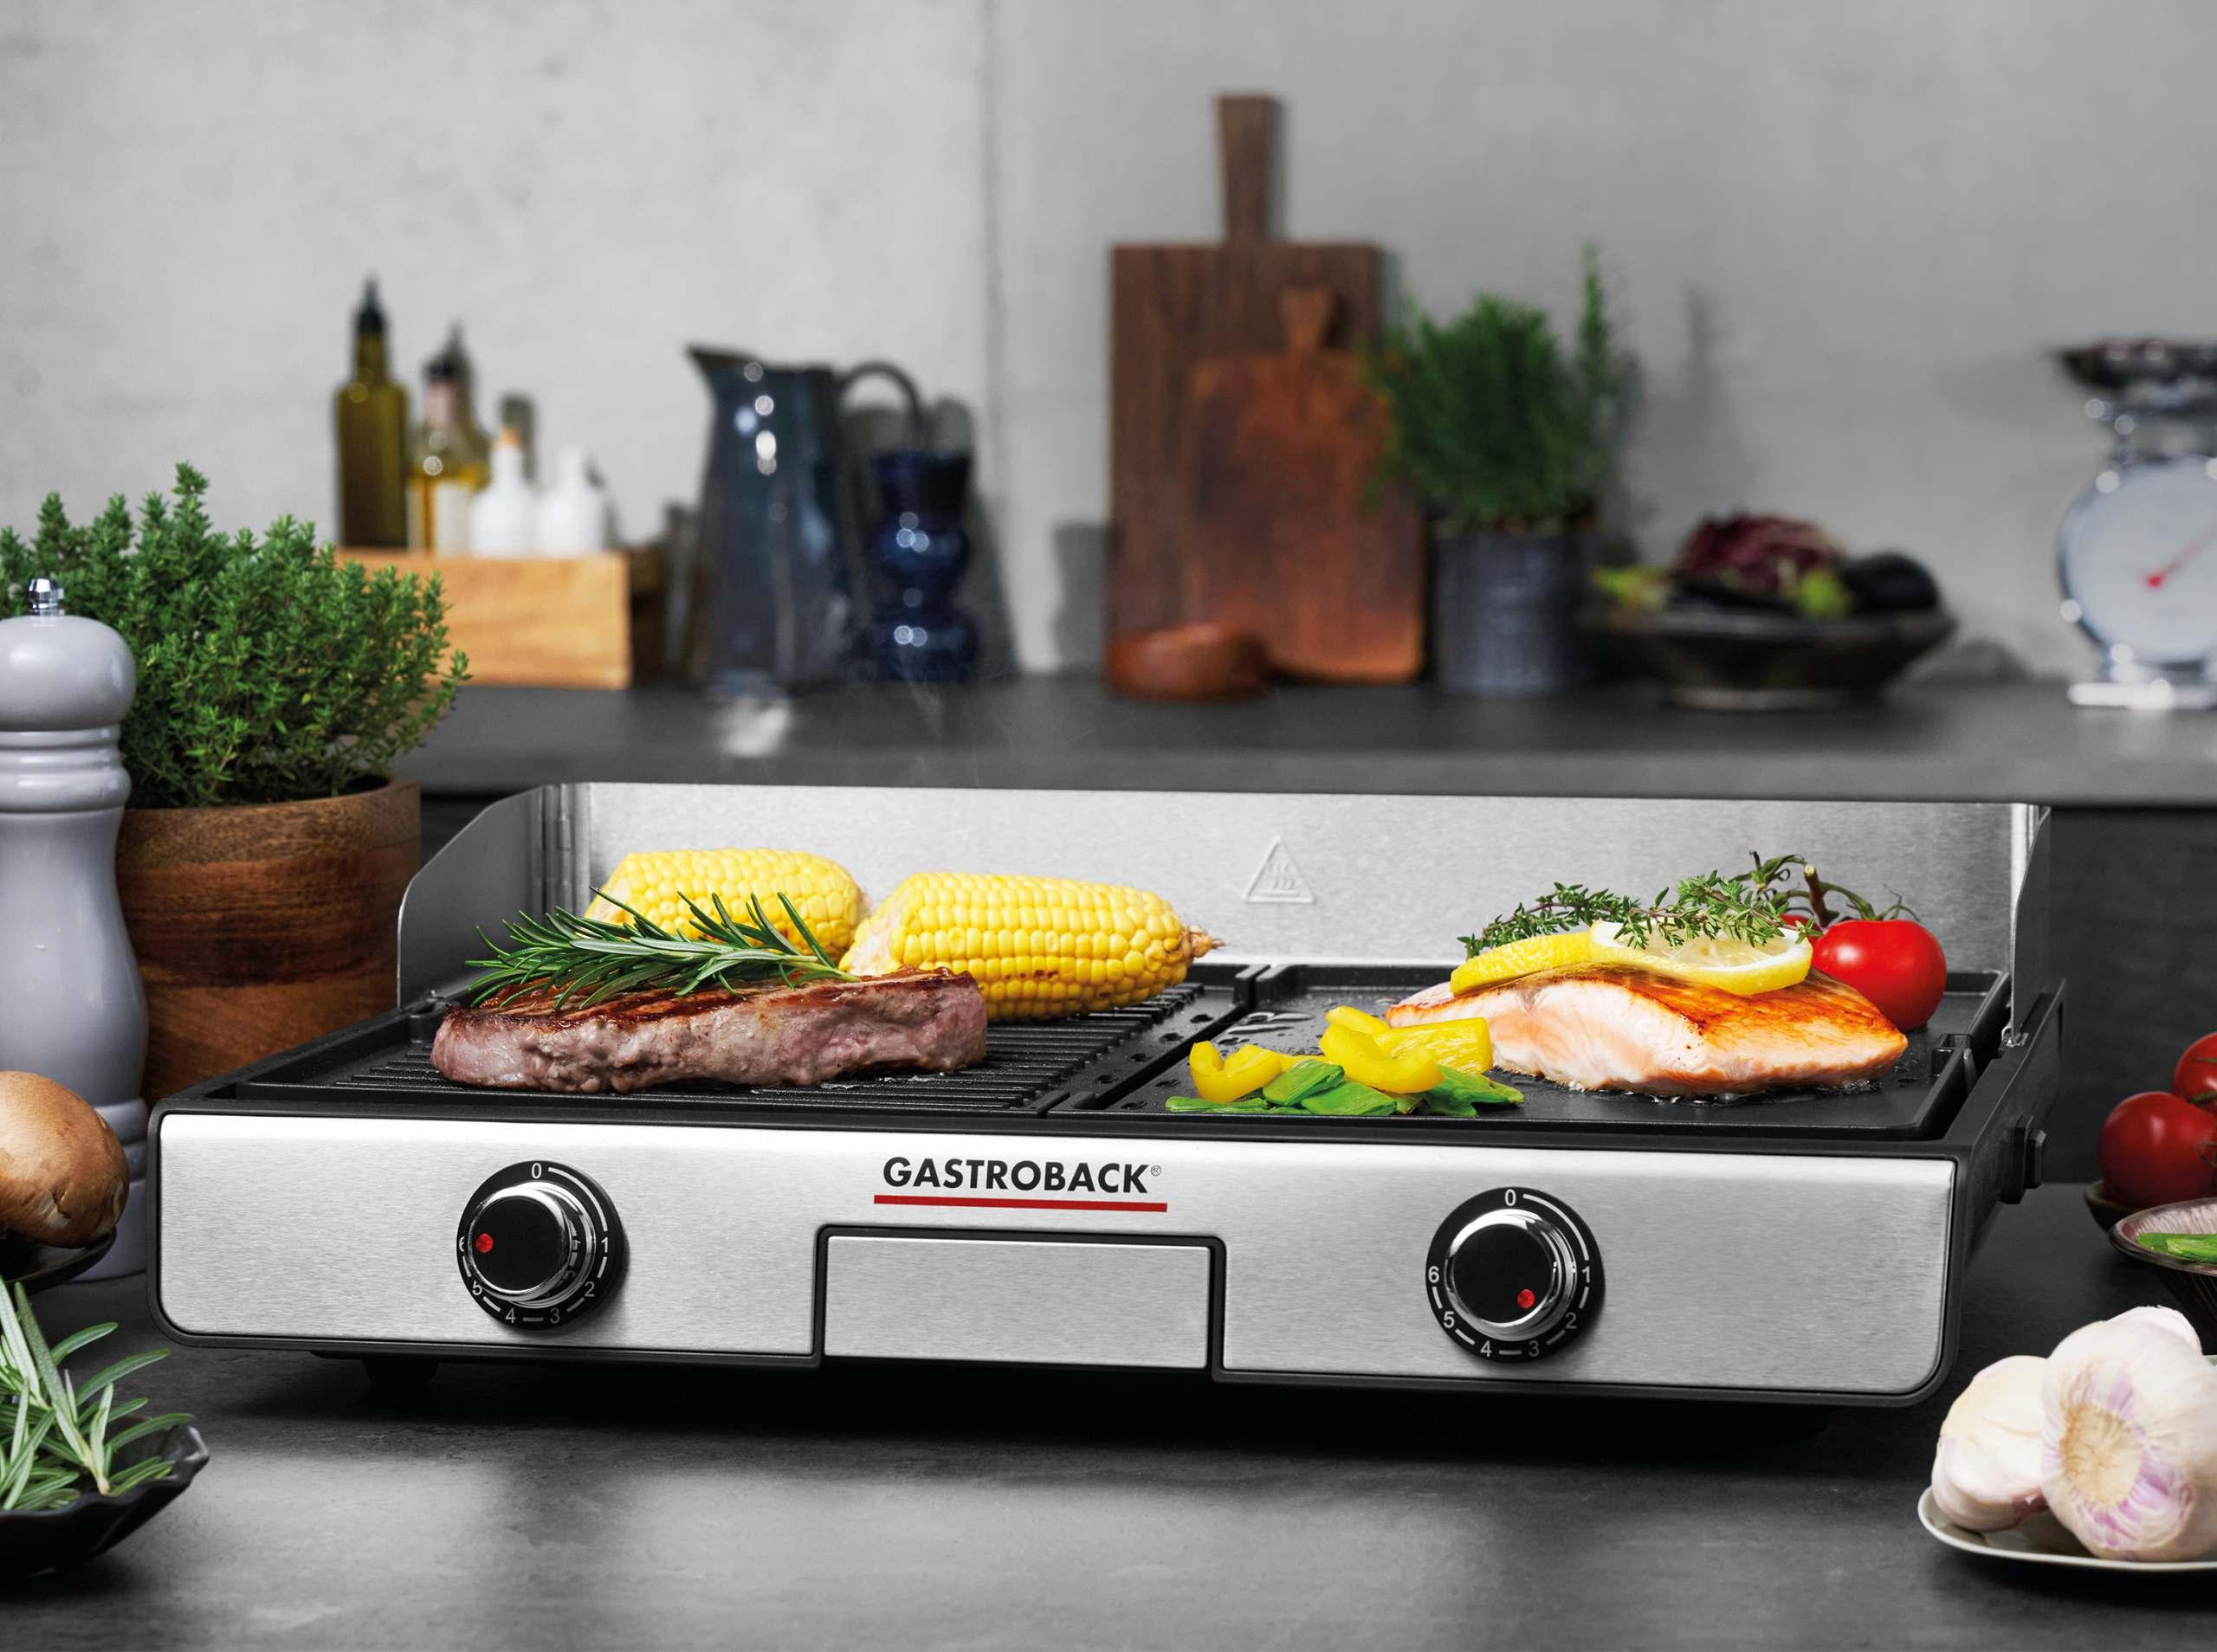 Gastroback DESIGN TISCHGRILL PLANCHA & BBQ